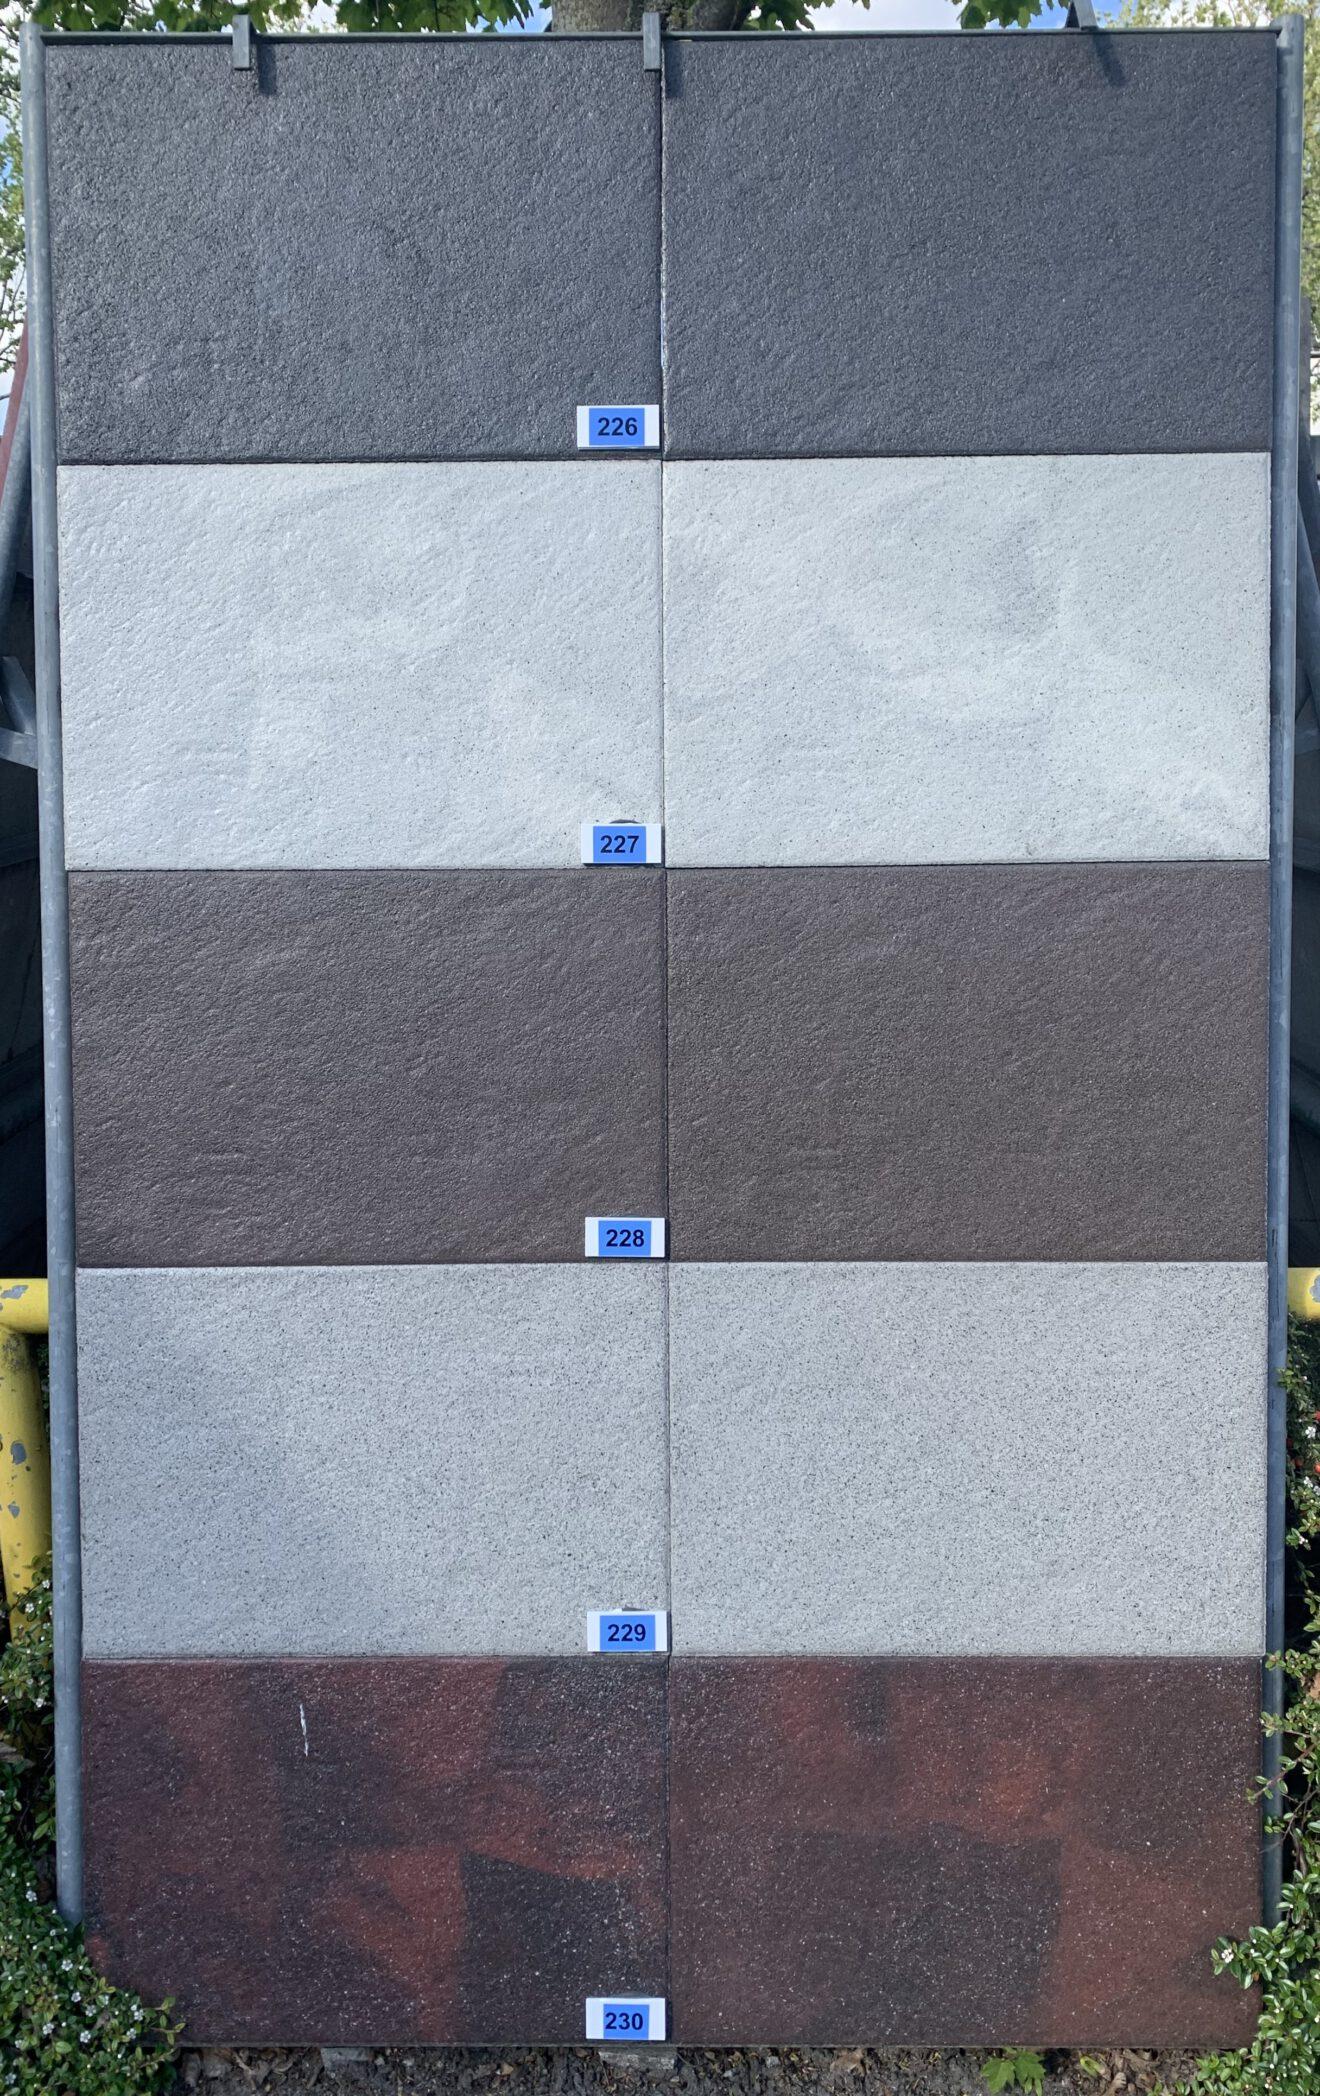 Gartenplatte Novaclean Brisbane bei Stolzenbach Baustoffe in Bremen kaufen